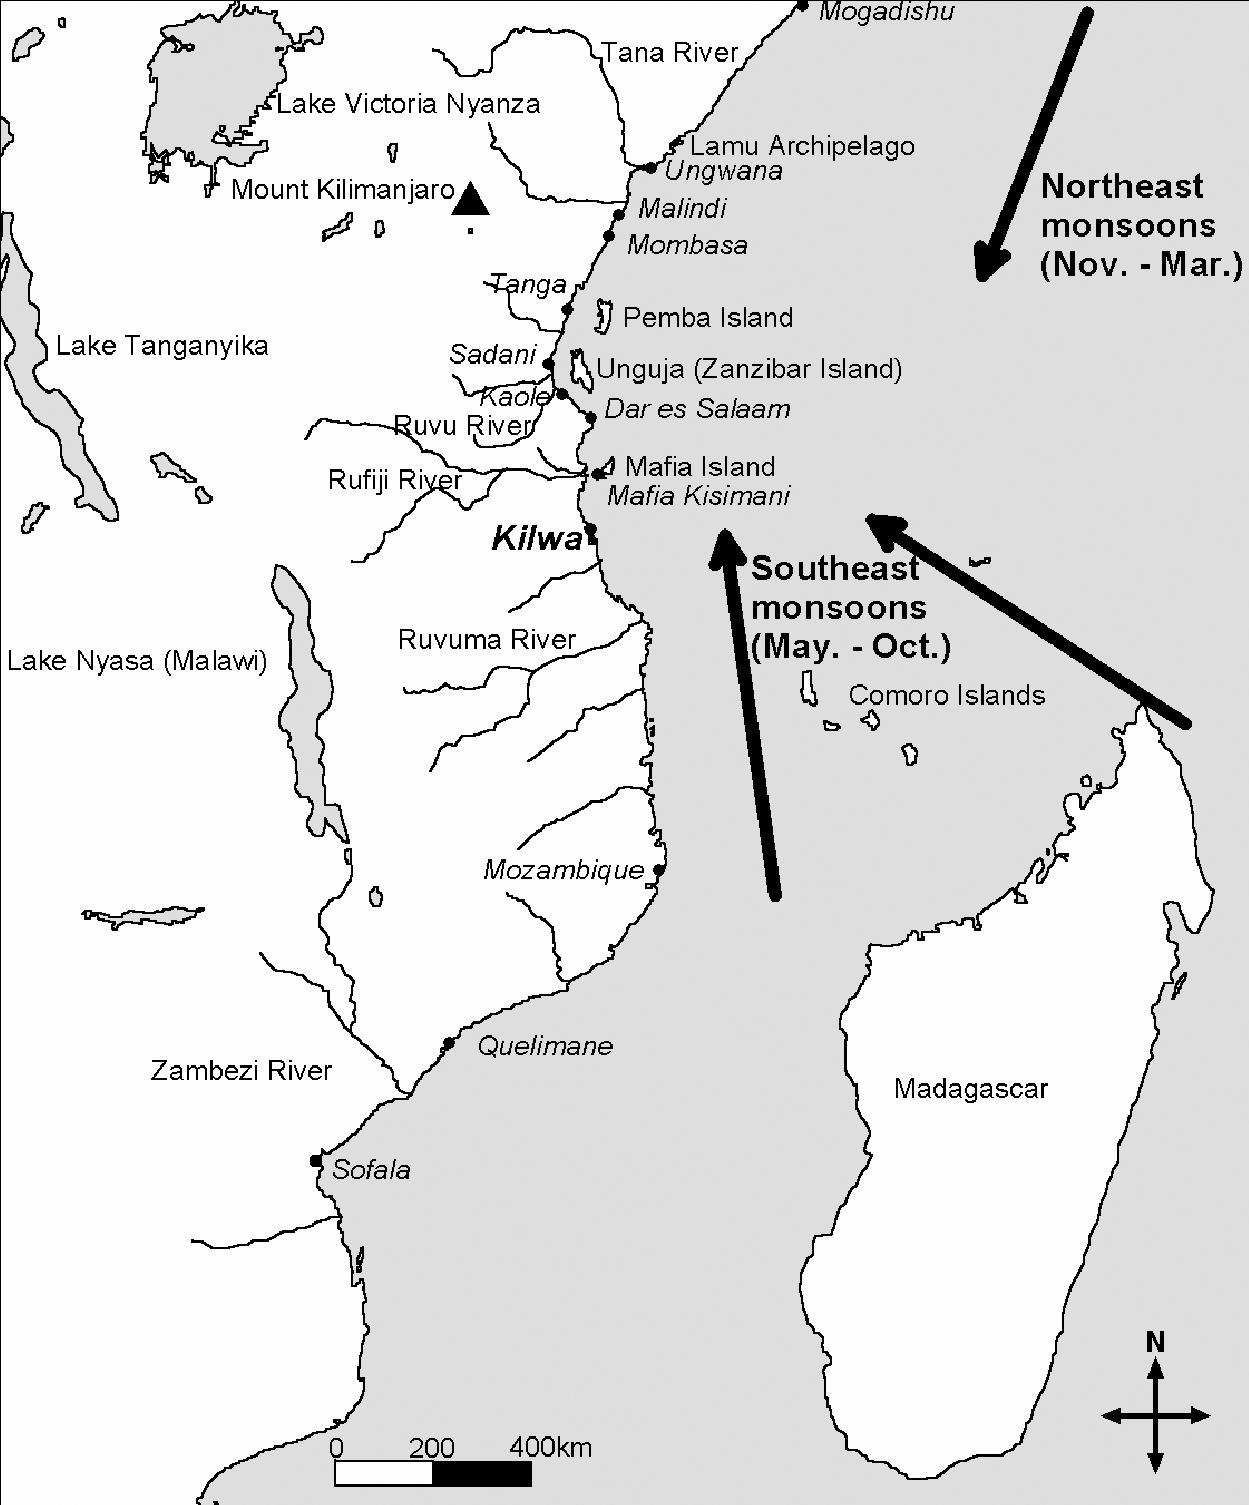 Interpreting Meval to Post-Meval Seafaring in South East ... on muslim world map, sahara world map, potosi world map, sofala world map, heian world map, ancient kilwa map, novgorod world map, ancient african kingdom map, varanasi world map, mogadishu world map, gujarat world map, surat world map, plain world map, isfahan world map, kilwa on a map, the meroe kush africa on map, tian shan world map,